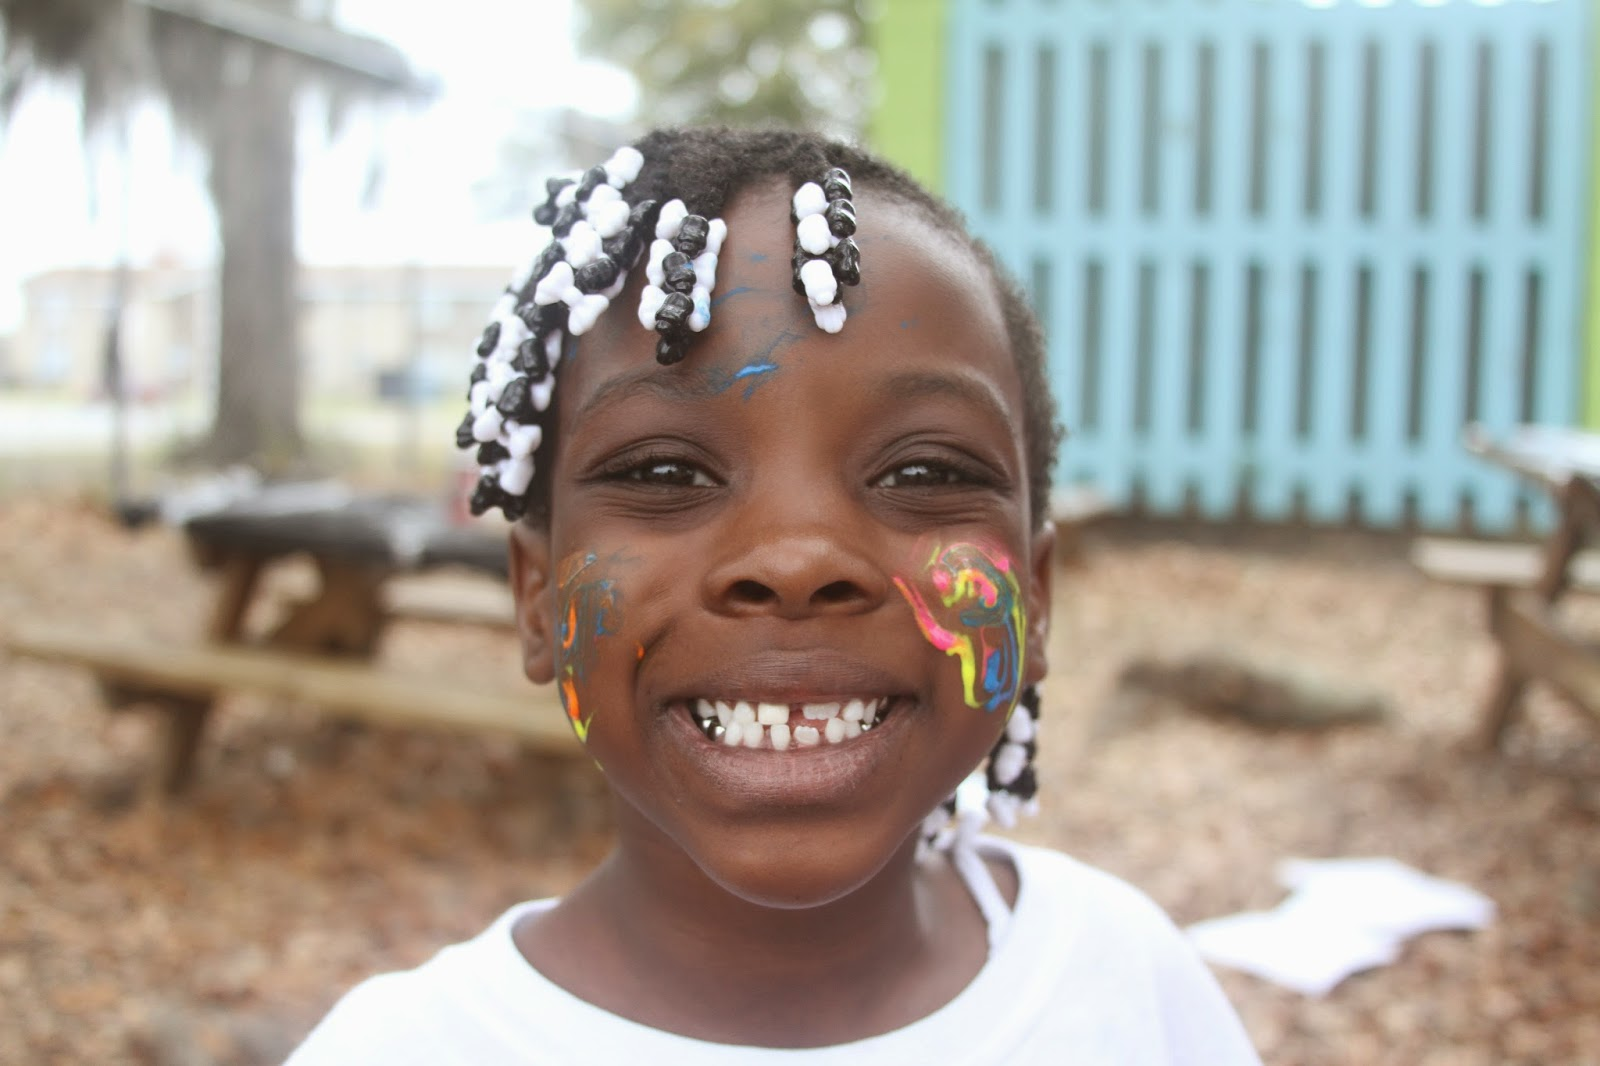 18th Annual City of Savannah Asian Festival | Loop It Up Savannah of ...